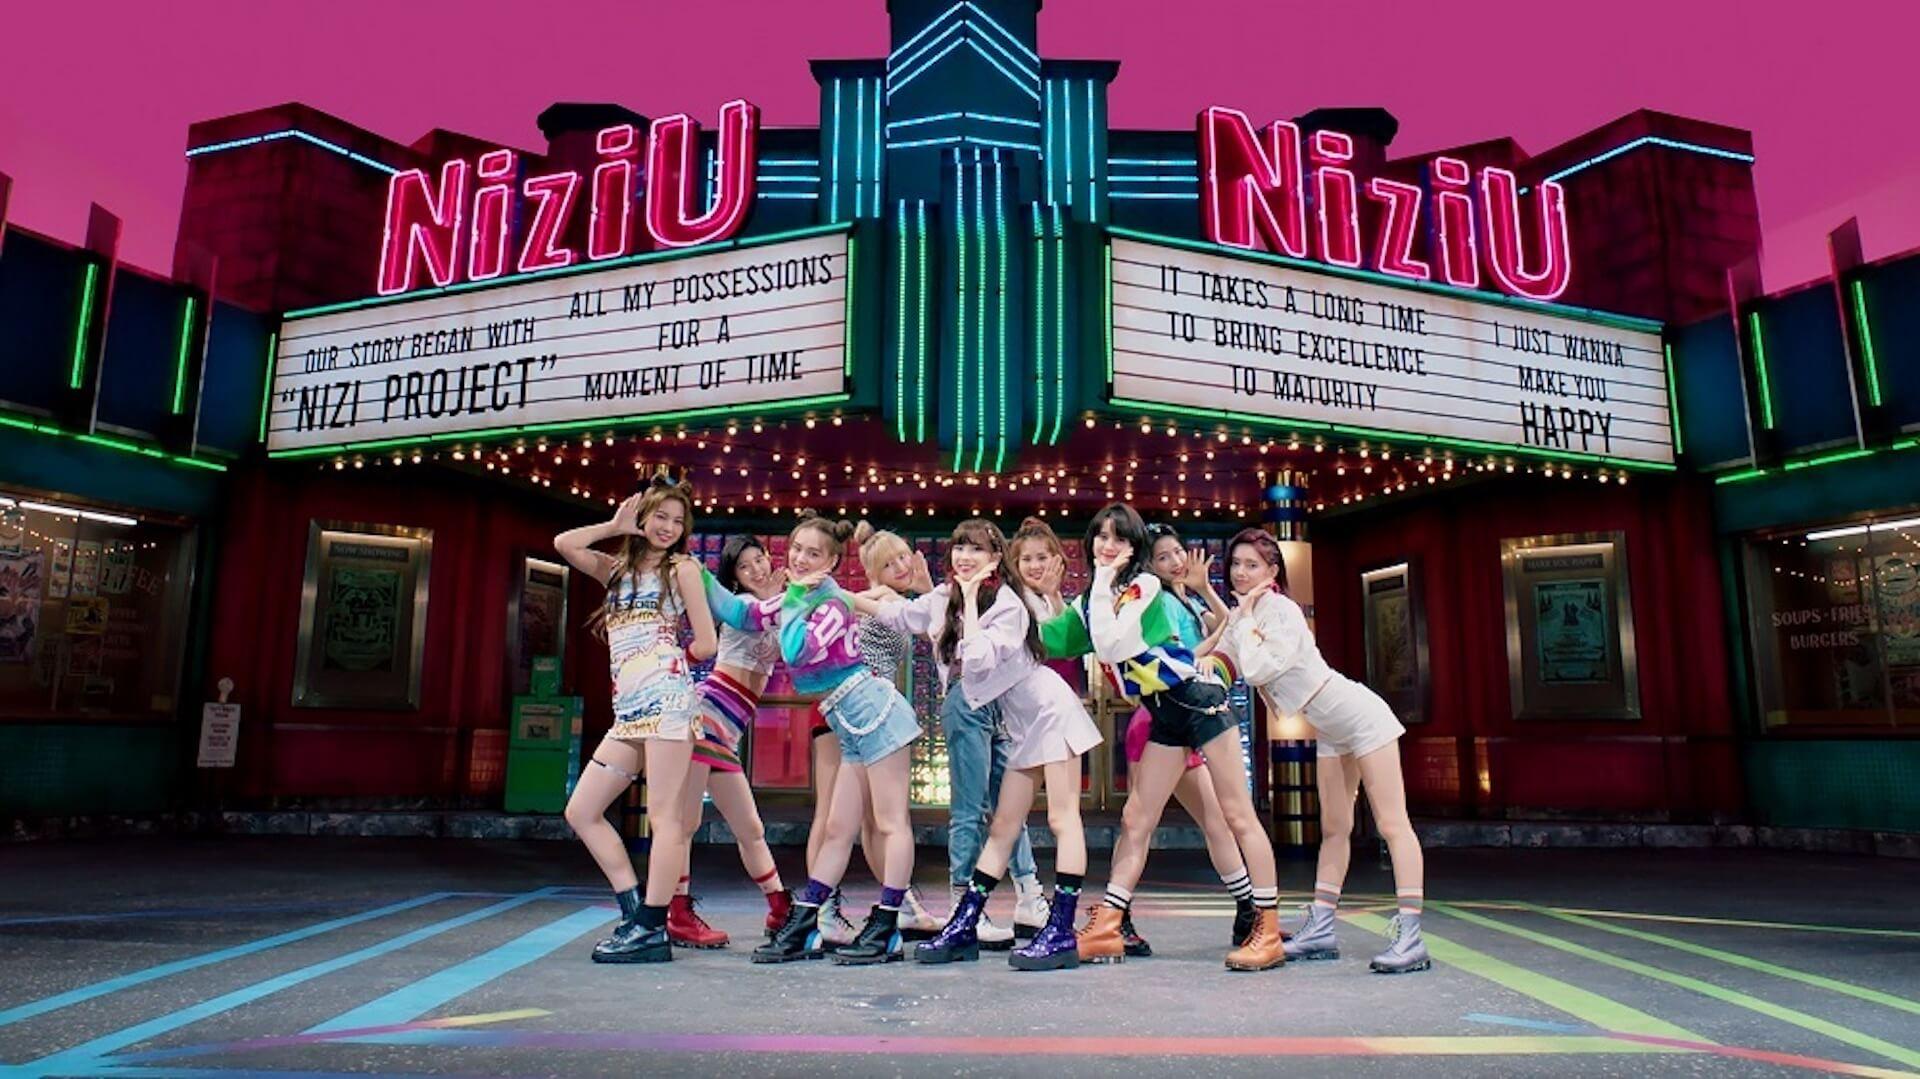 NiziU、プレデビューアルバム『Make you happy』&MVを初解禁!ファンクラブ「WithU」も明日始動 music200630_niziu_3